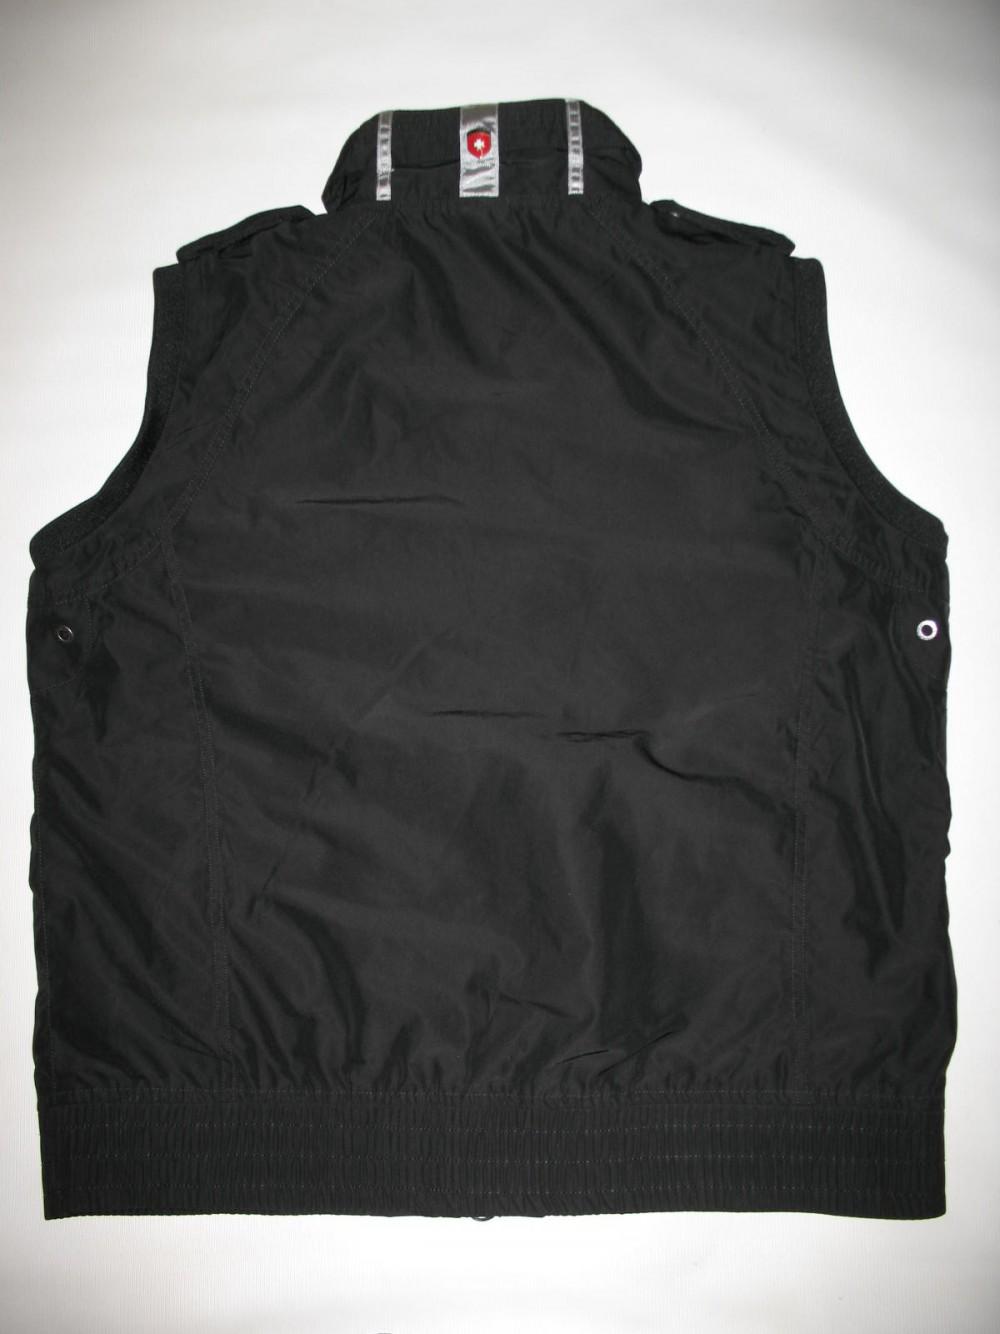 Жилет WELLENSTEYN infinity vest (размер XL) - 2